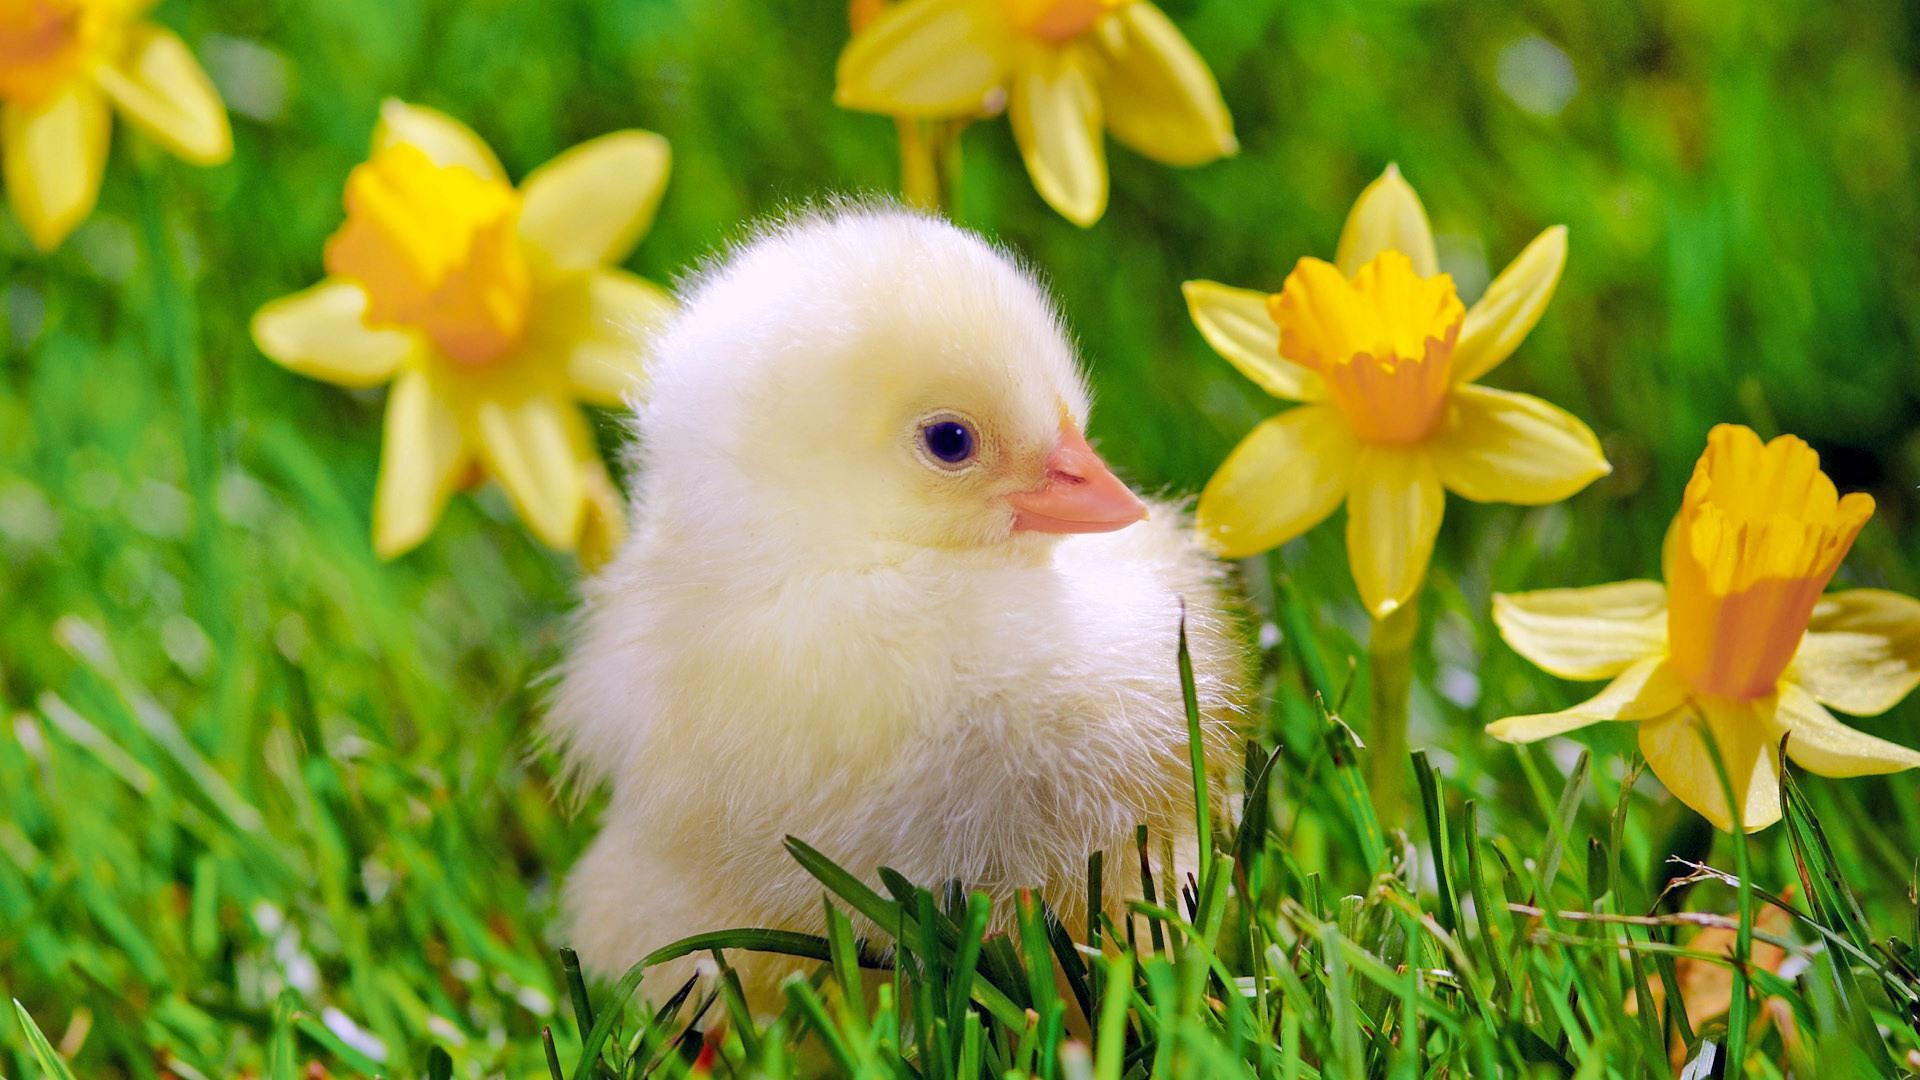 Baby Chicks HD Wallpapers | Download Free Desktop Wallpaper Images .